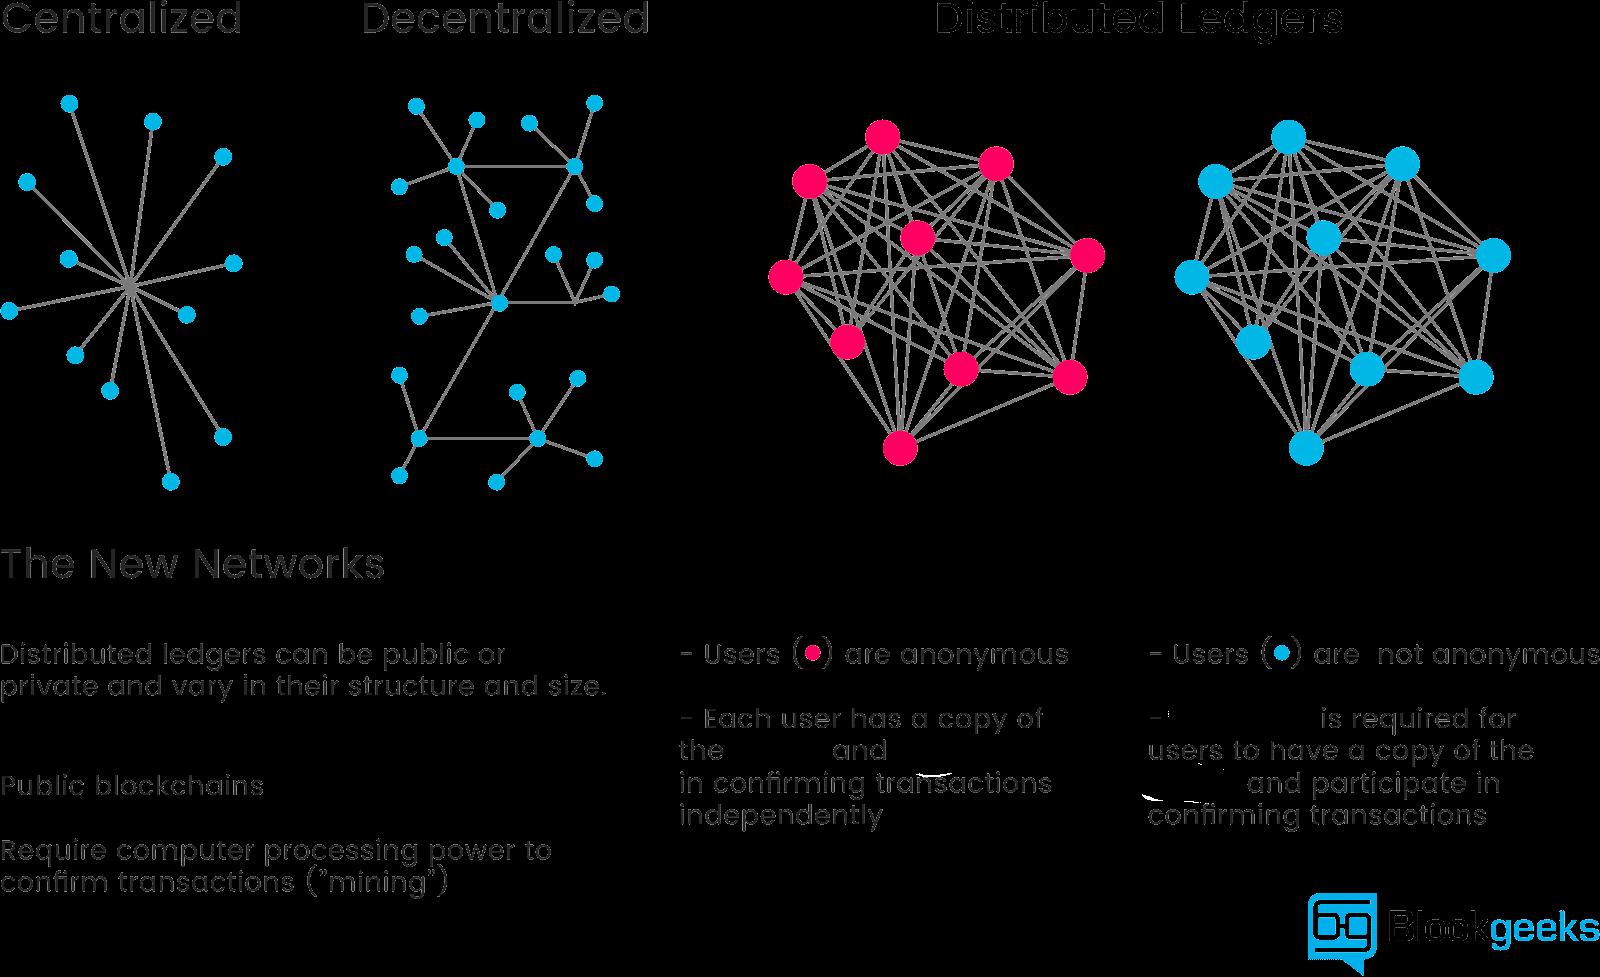 blockchain_image_1